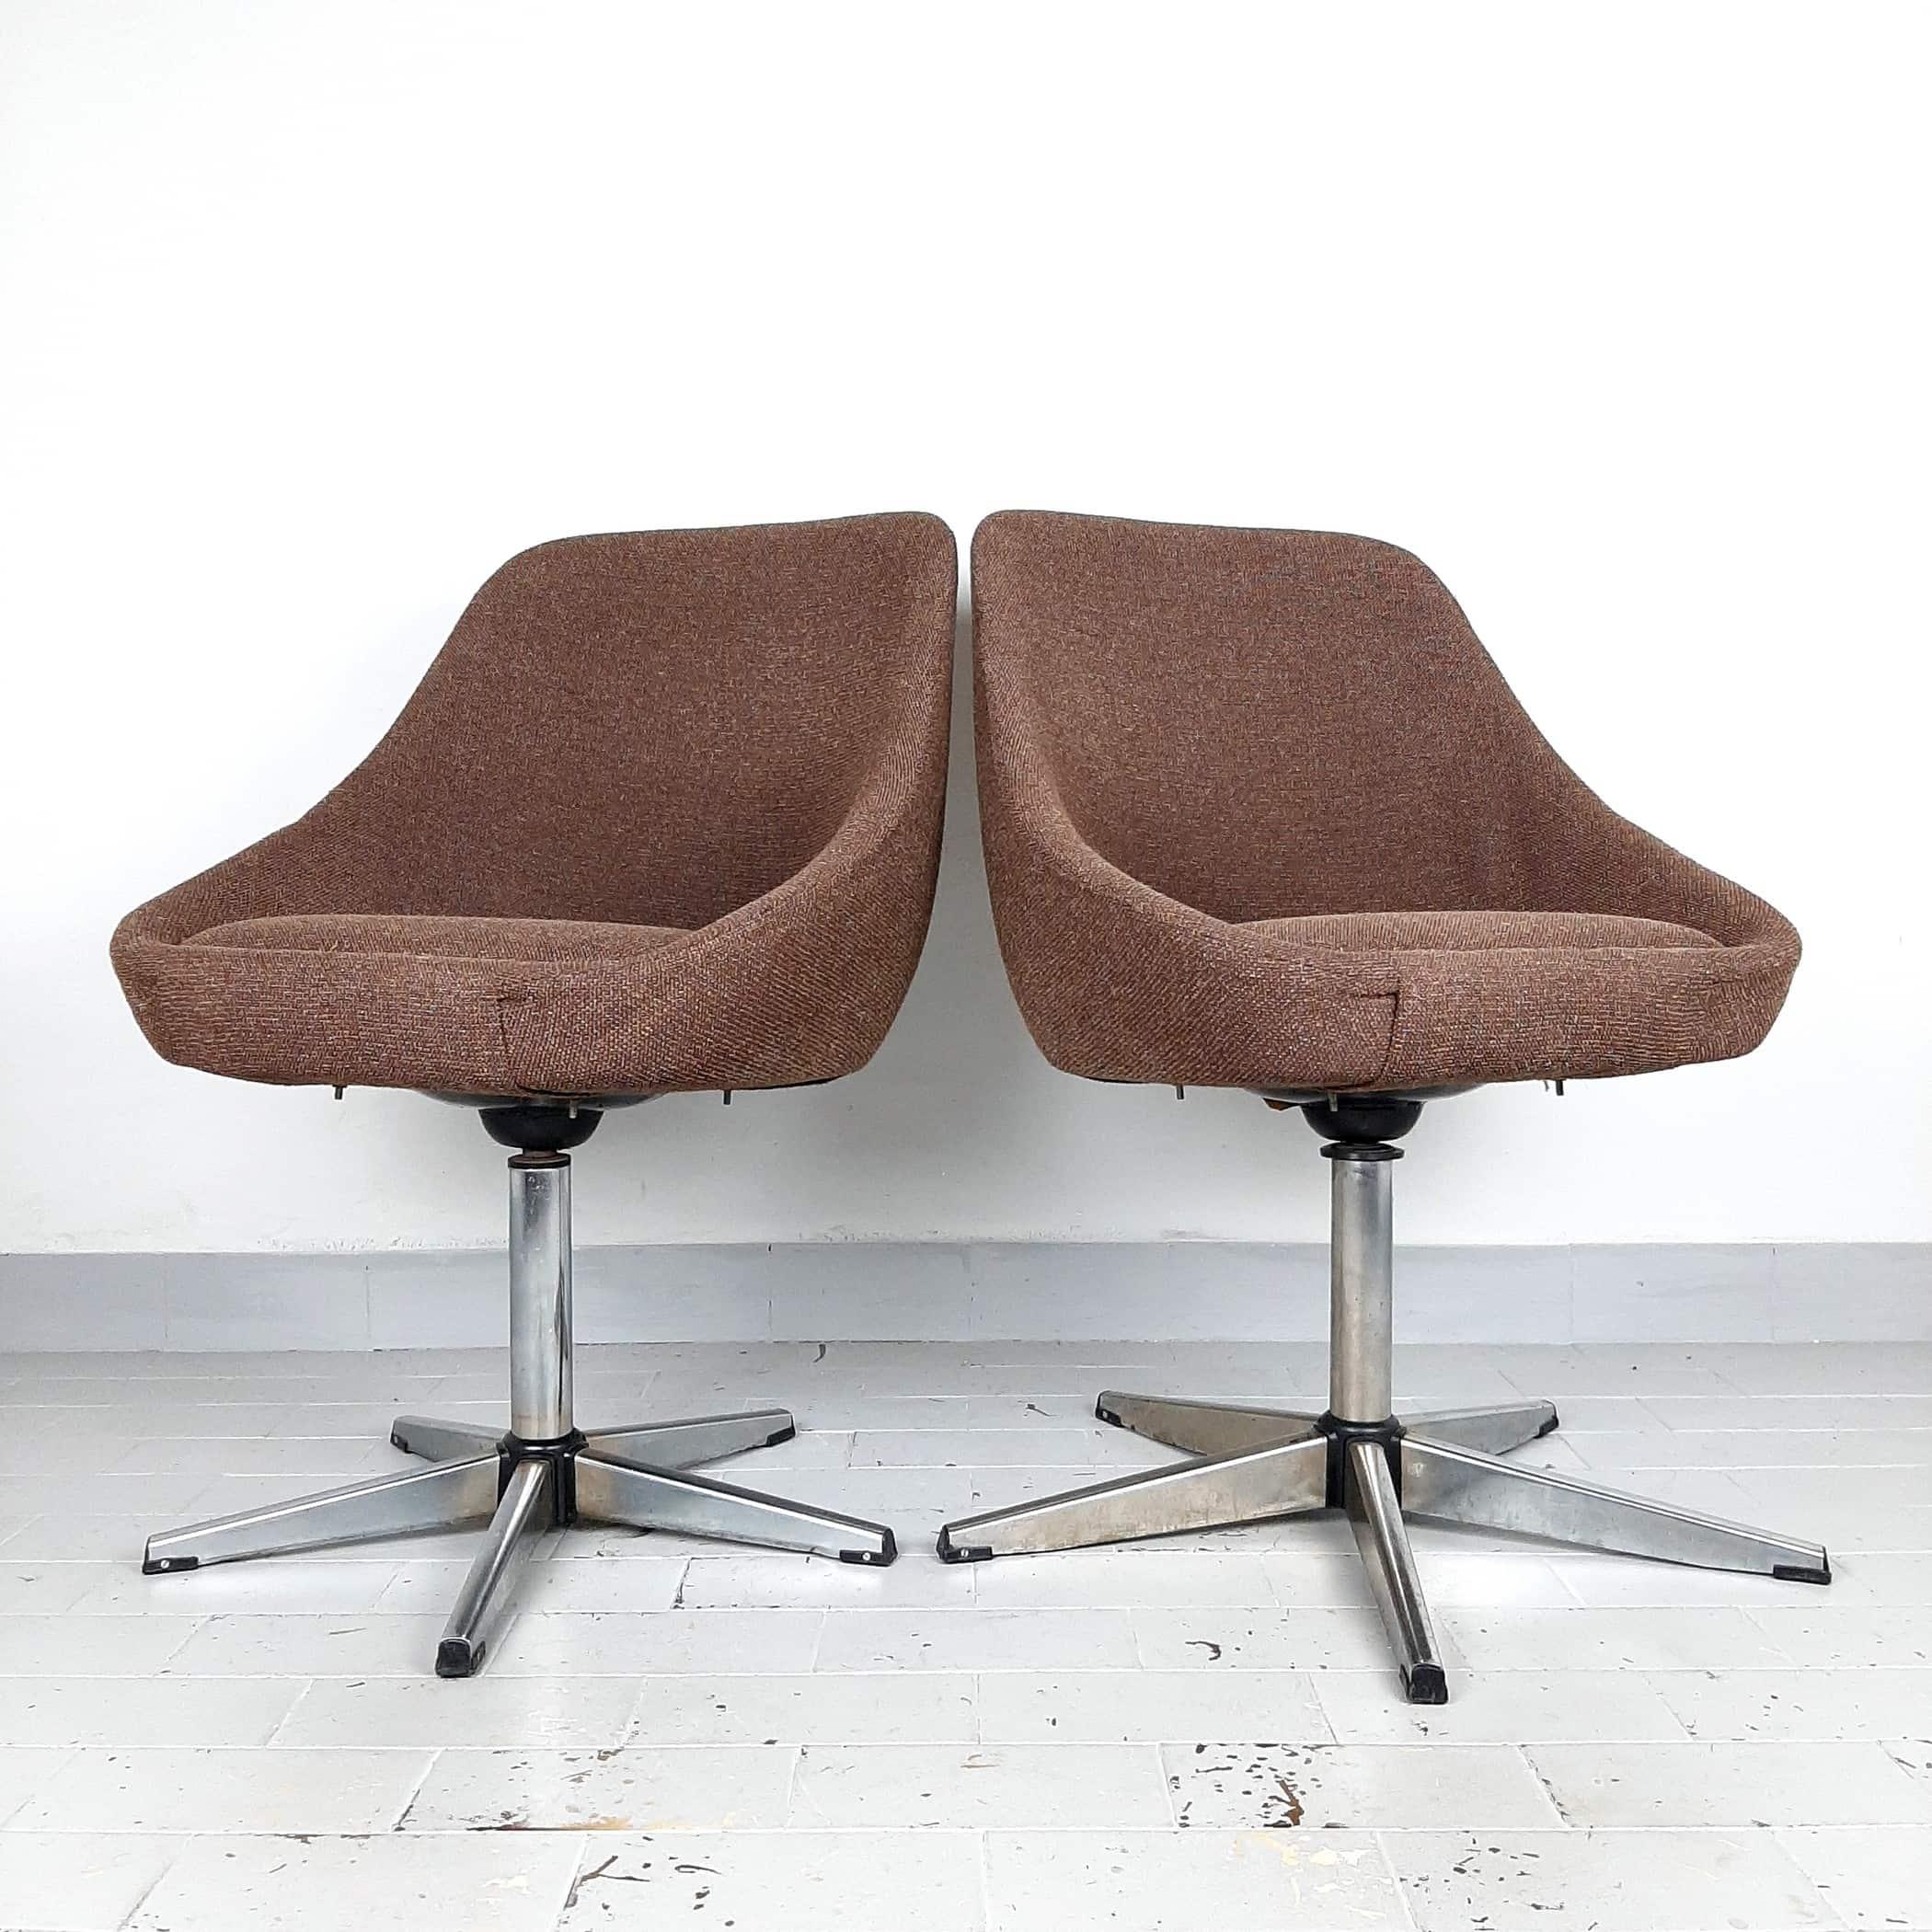 1 of 2 Mid-century office chair Yugoslavia 1970s Retro home office Egg lounge chair Brown Original Textil Swivel chrome metal leg